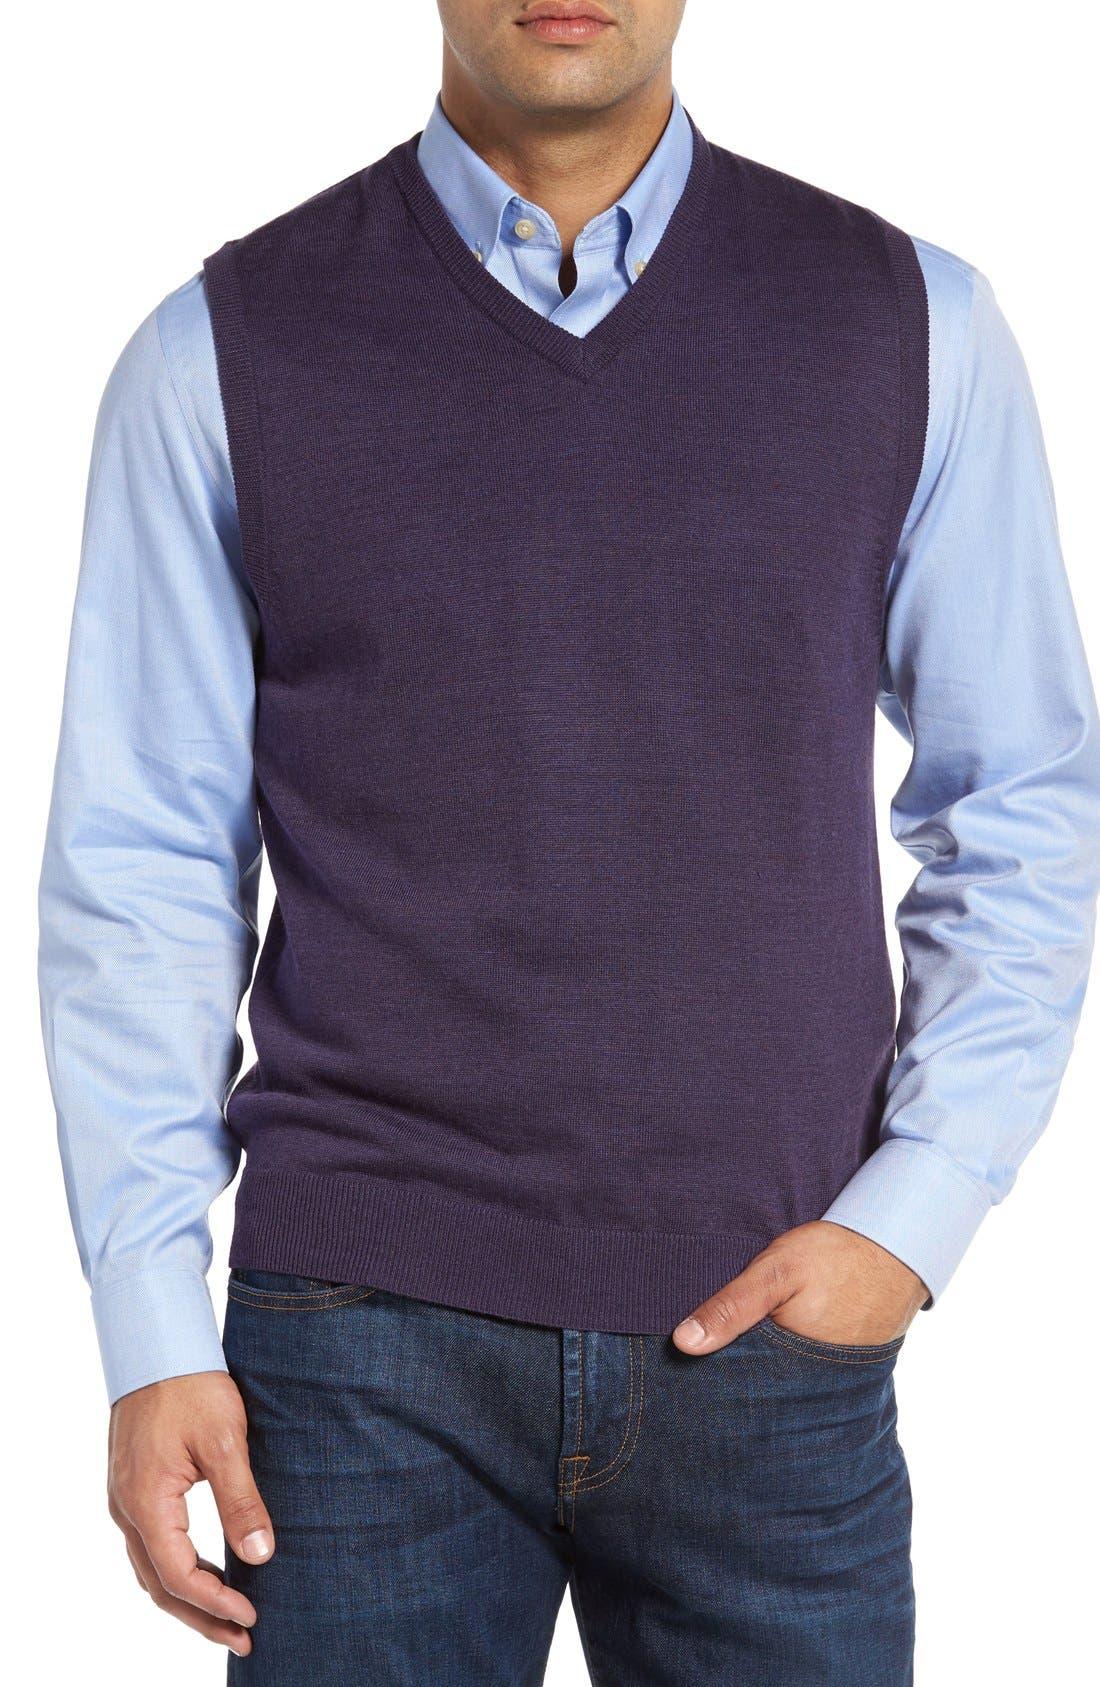 Main Image - Cutter & Buck 'Douglas' Merino Wool Blend V-Neck Sweater Vest (Online Only)